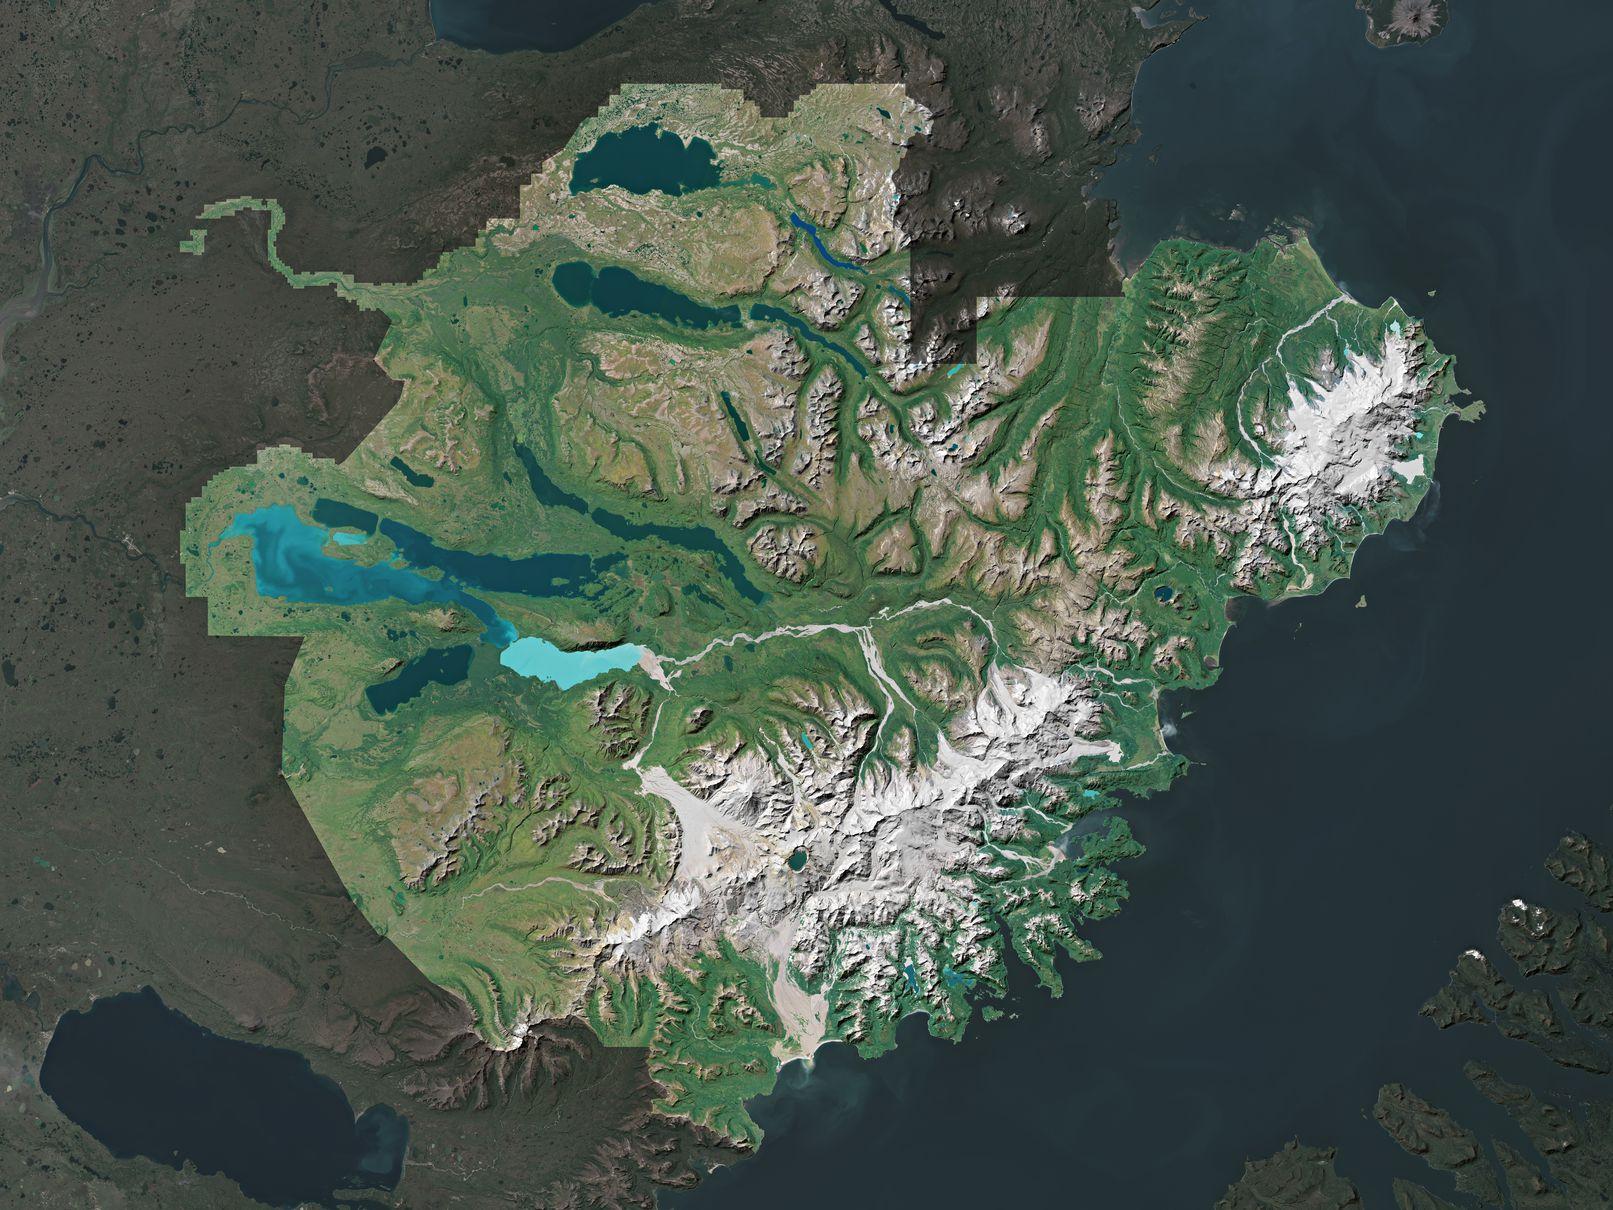 Map of Katmai National Park